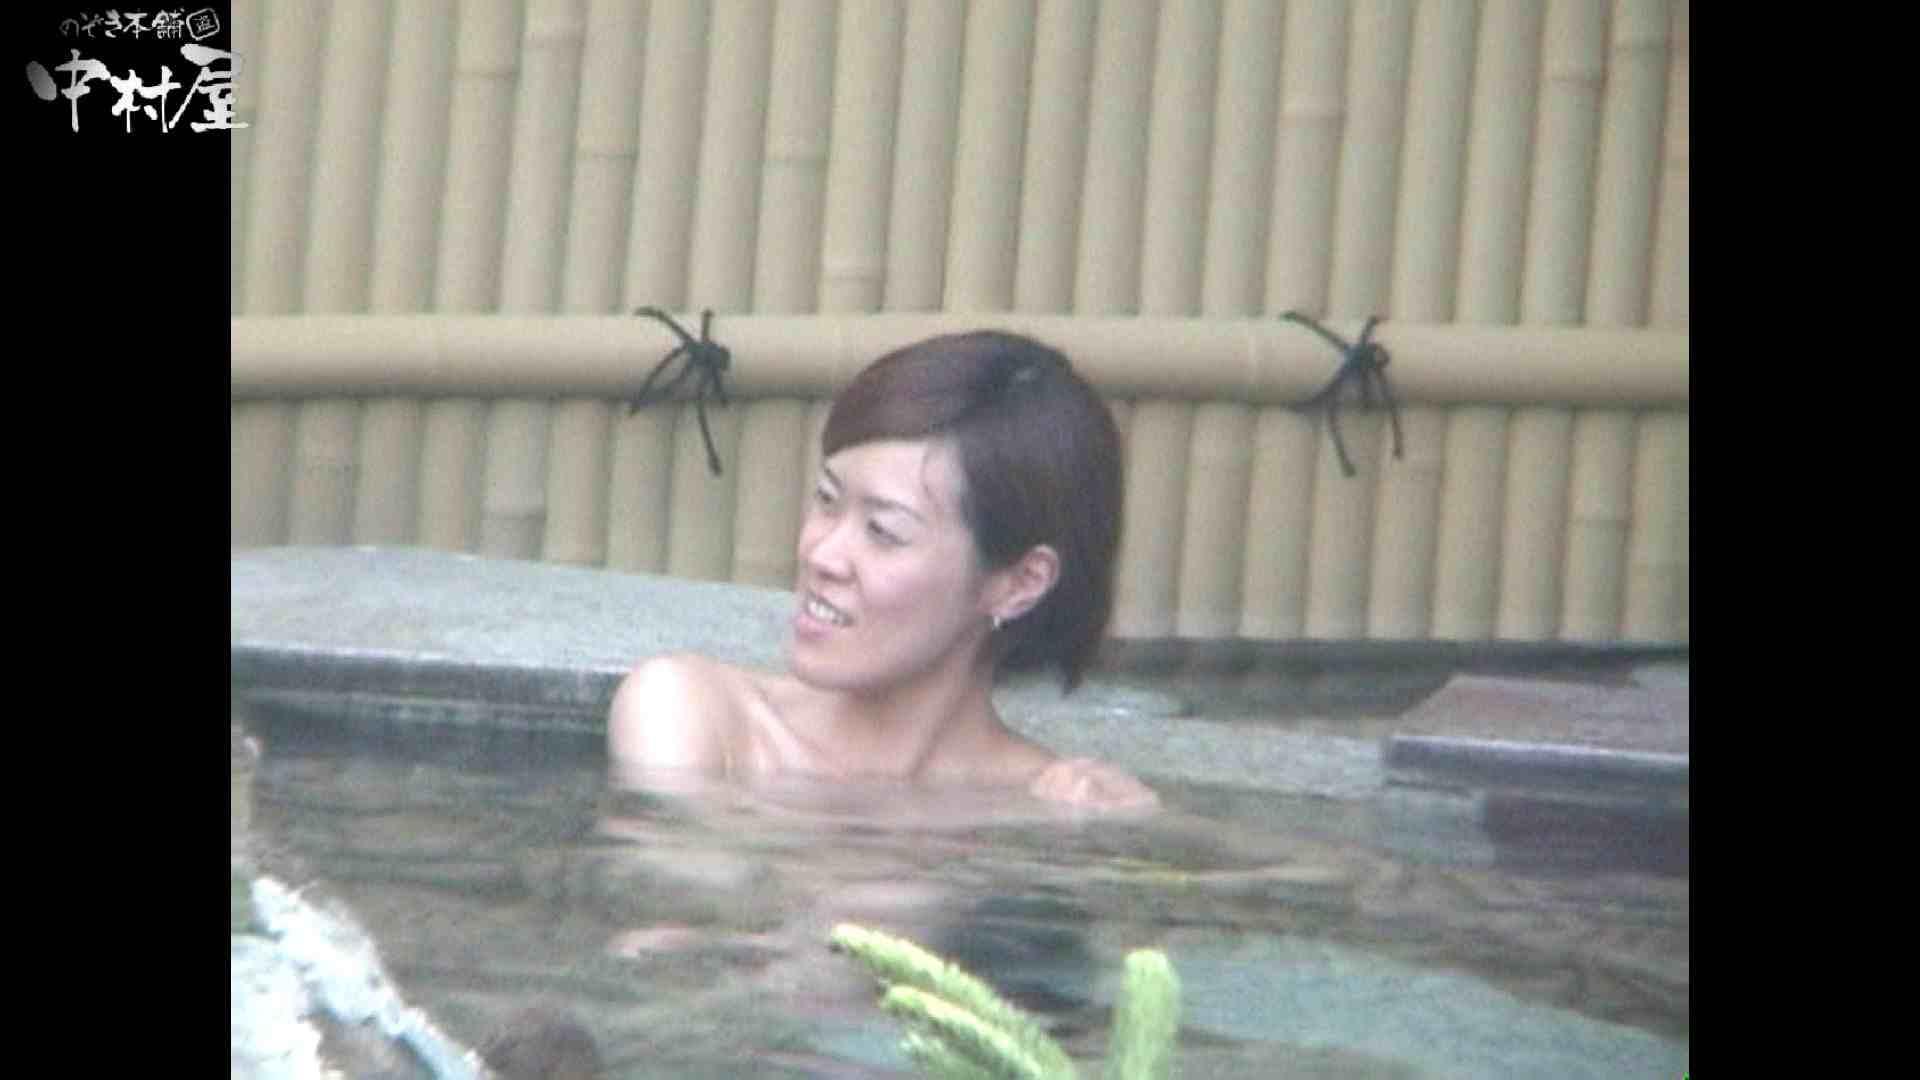 Aquaな露天風呂Vol.961 盗撮 のぞき動画画像 61枚 23